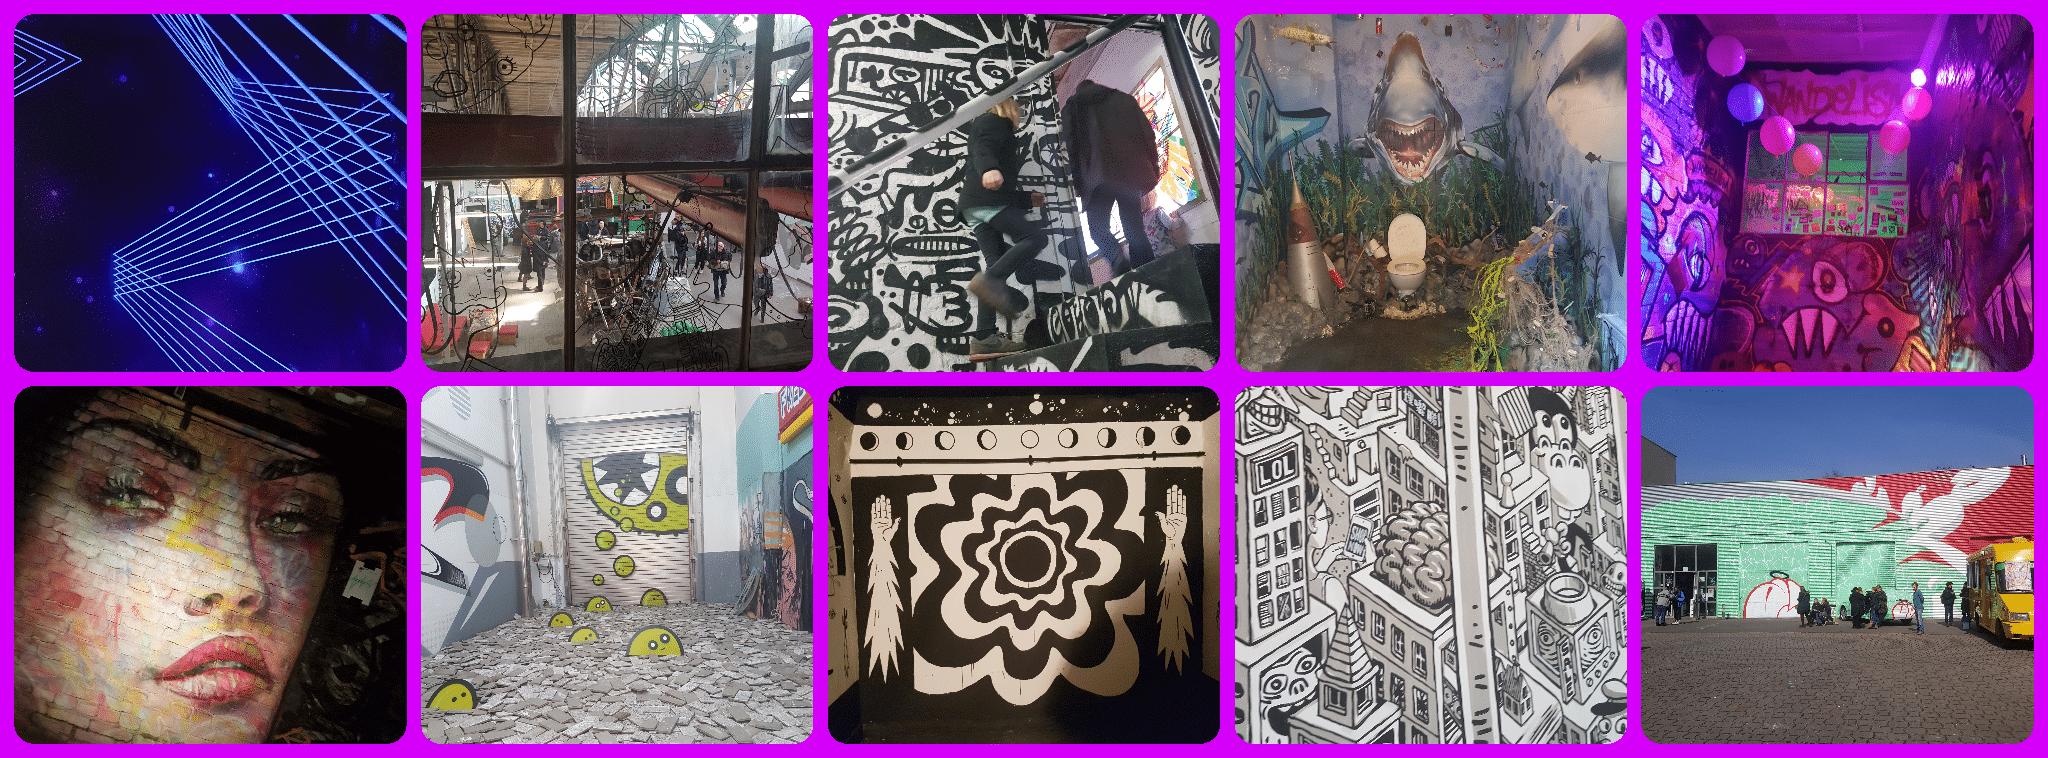 Street Art Ausstellung Wandelism in Berlin Wilmersdorf